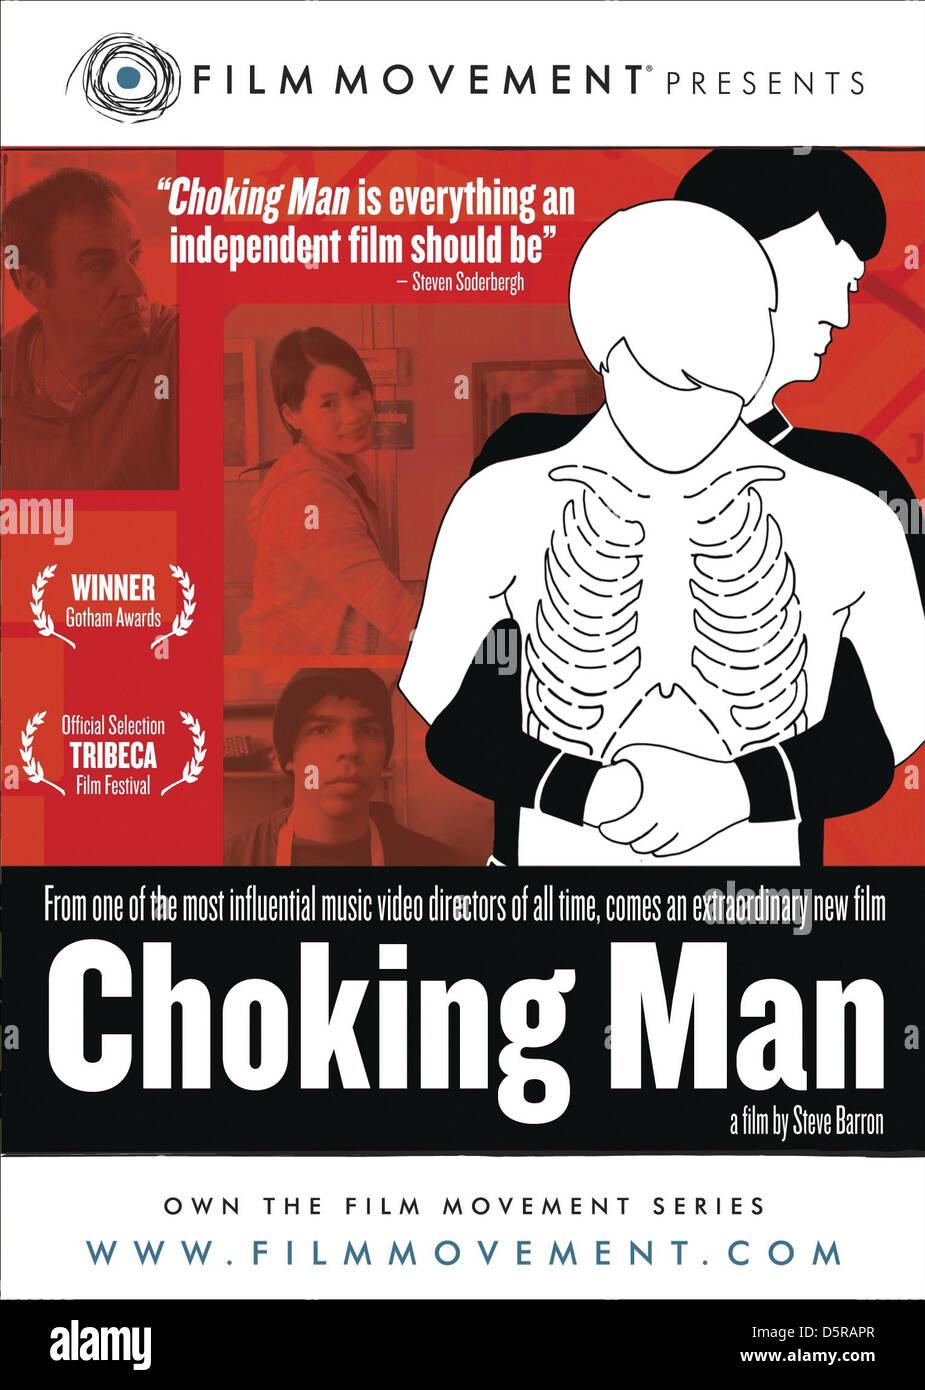 HEIMLICH MANOEUVRE MOVIE POSTER CHOKING MAN (2006) - Stock Image